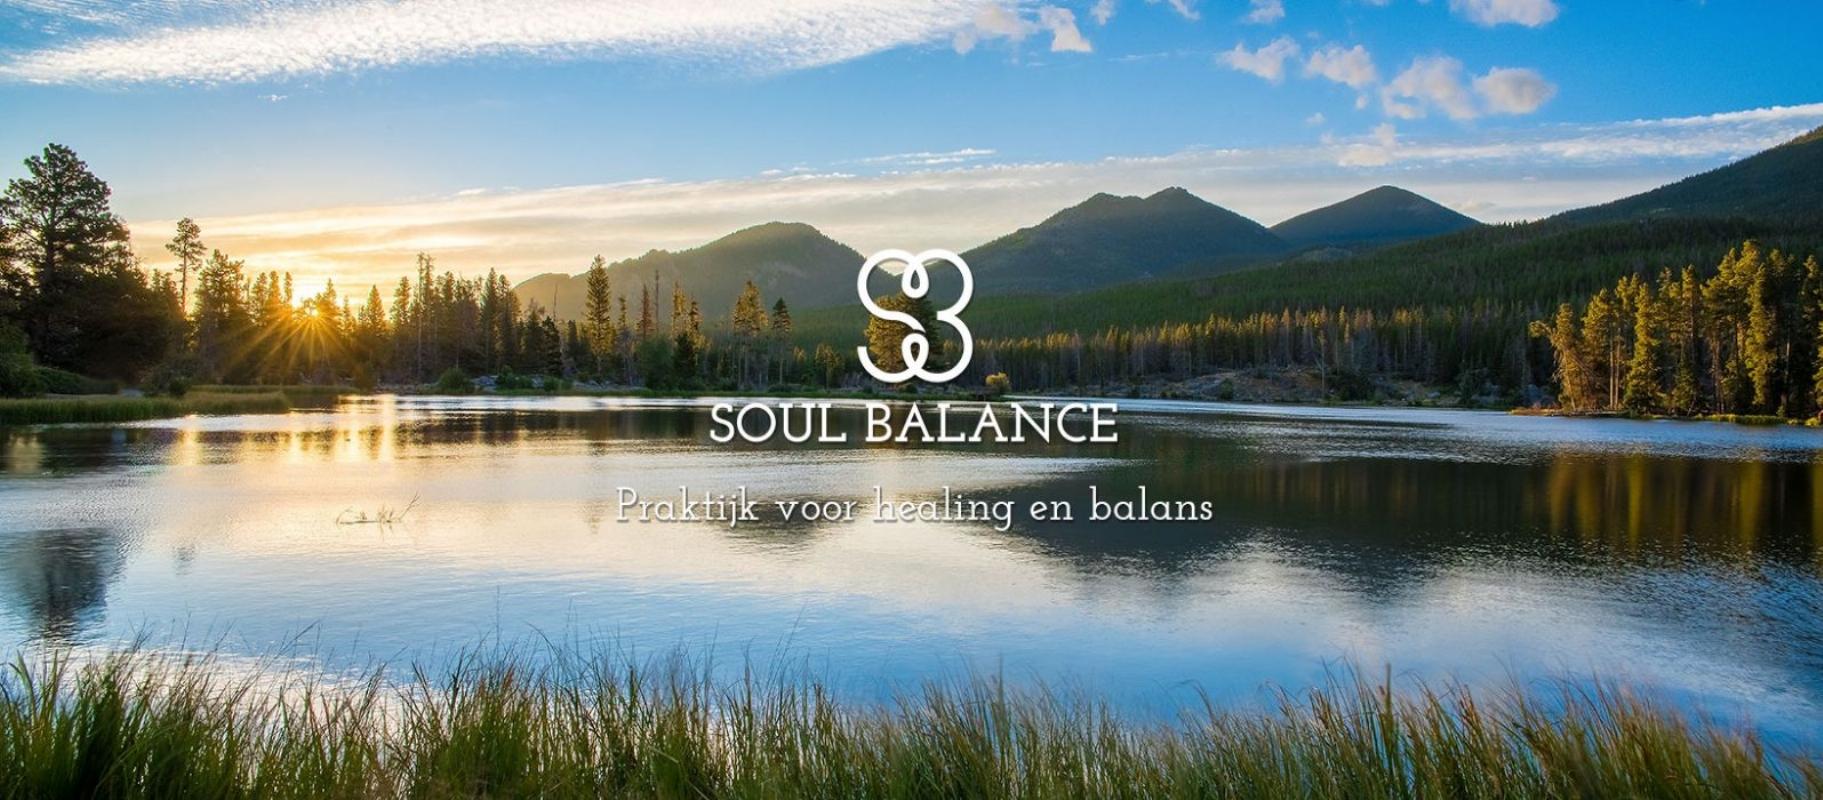 Soul Balance